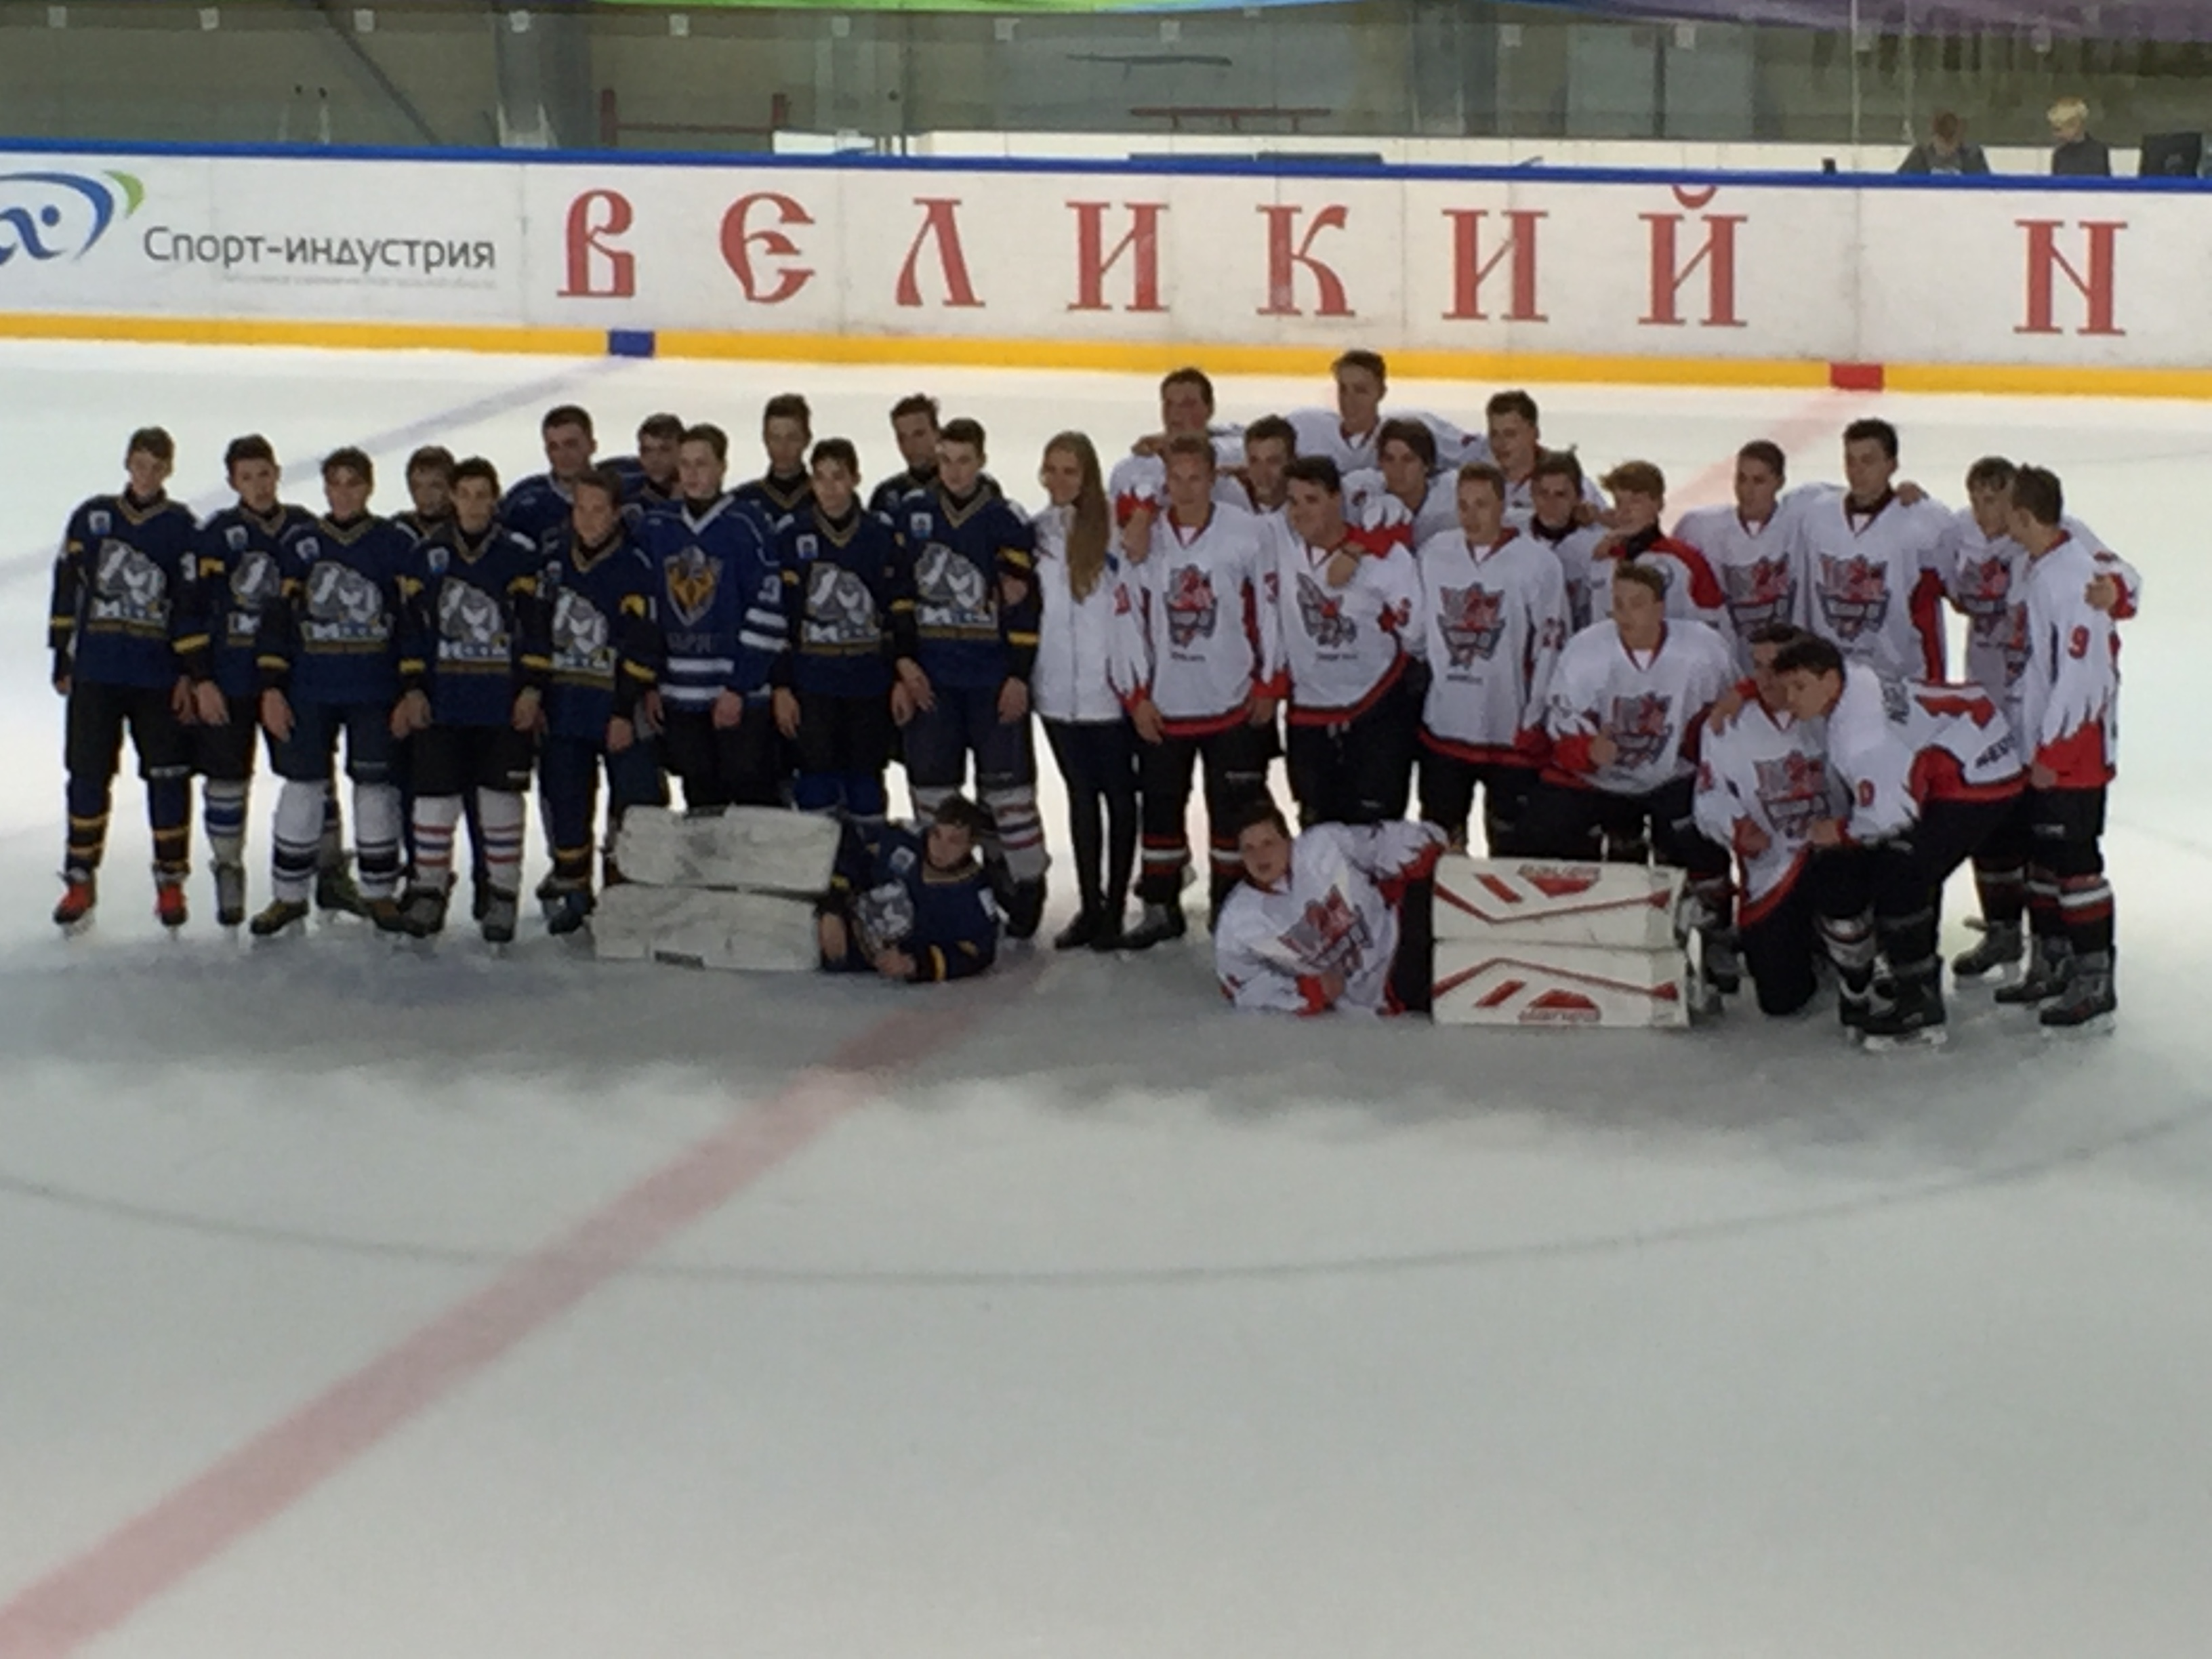 Eishockey in Pskow